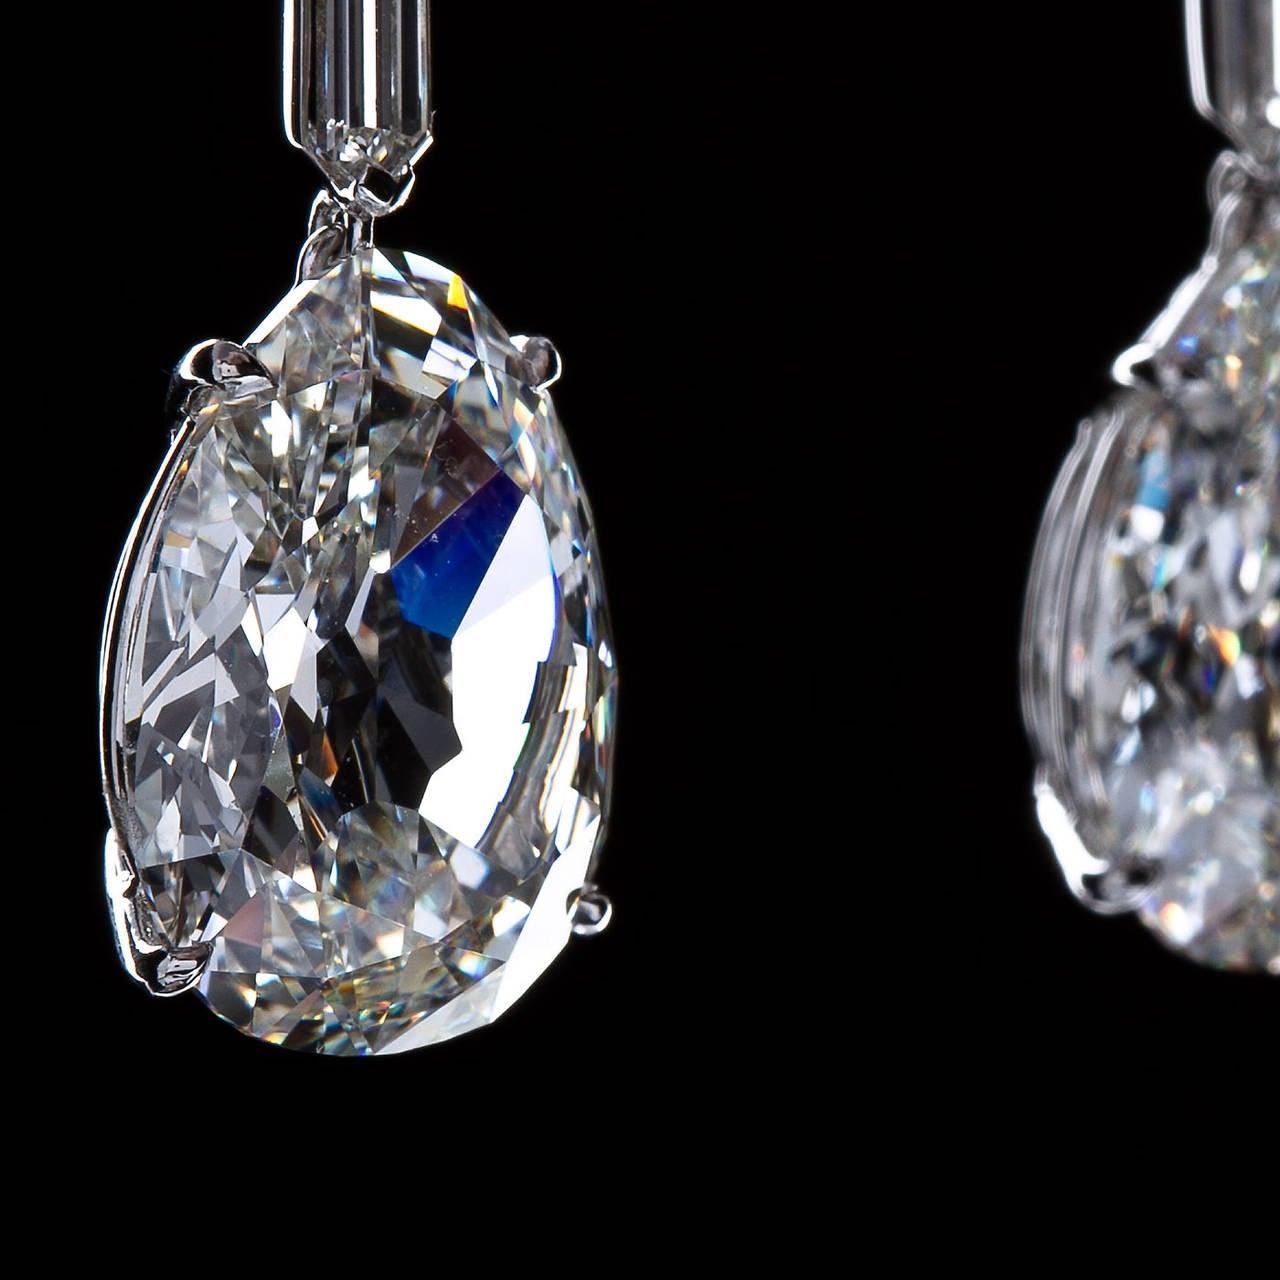 Important 19 Carat Gia Cert Antique Pear Diamond Drop Earrings 2